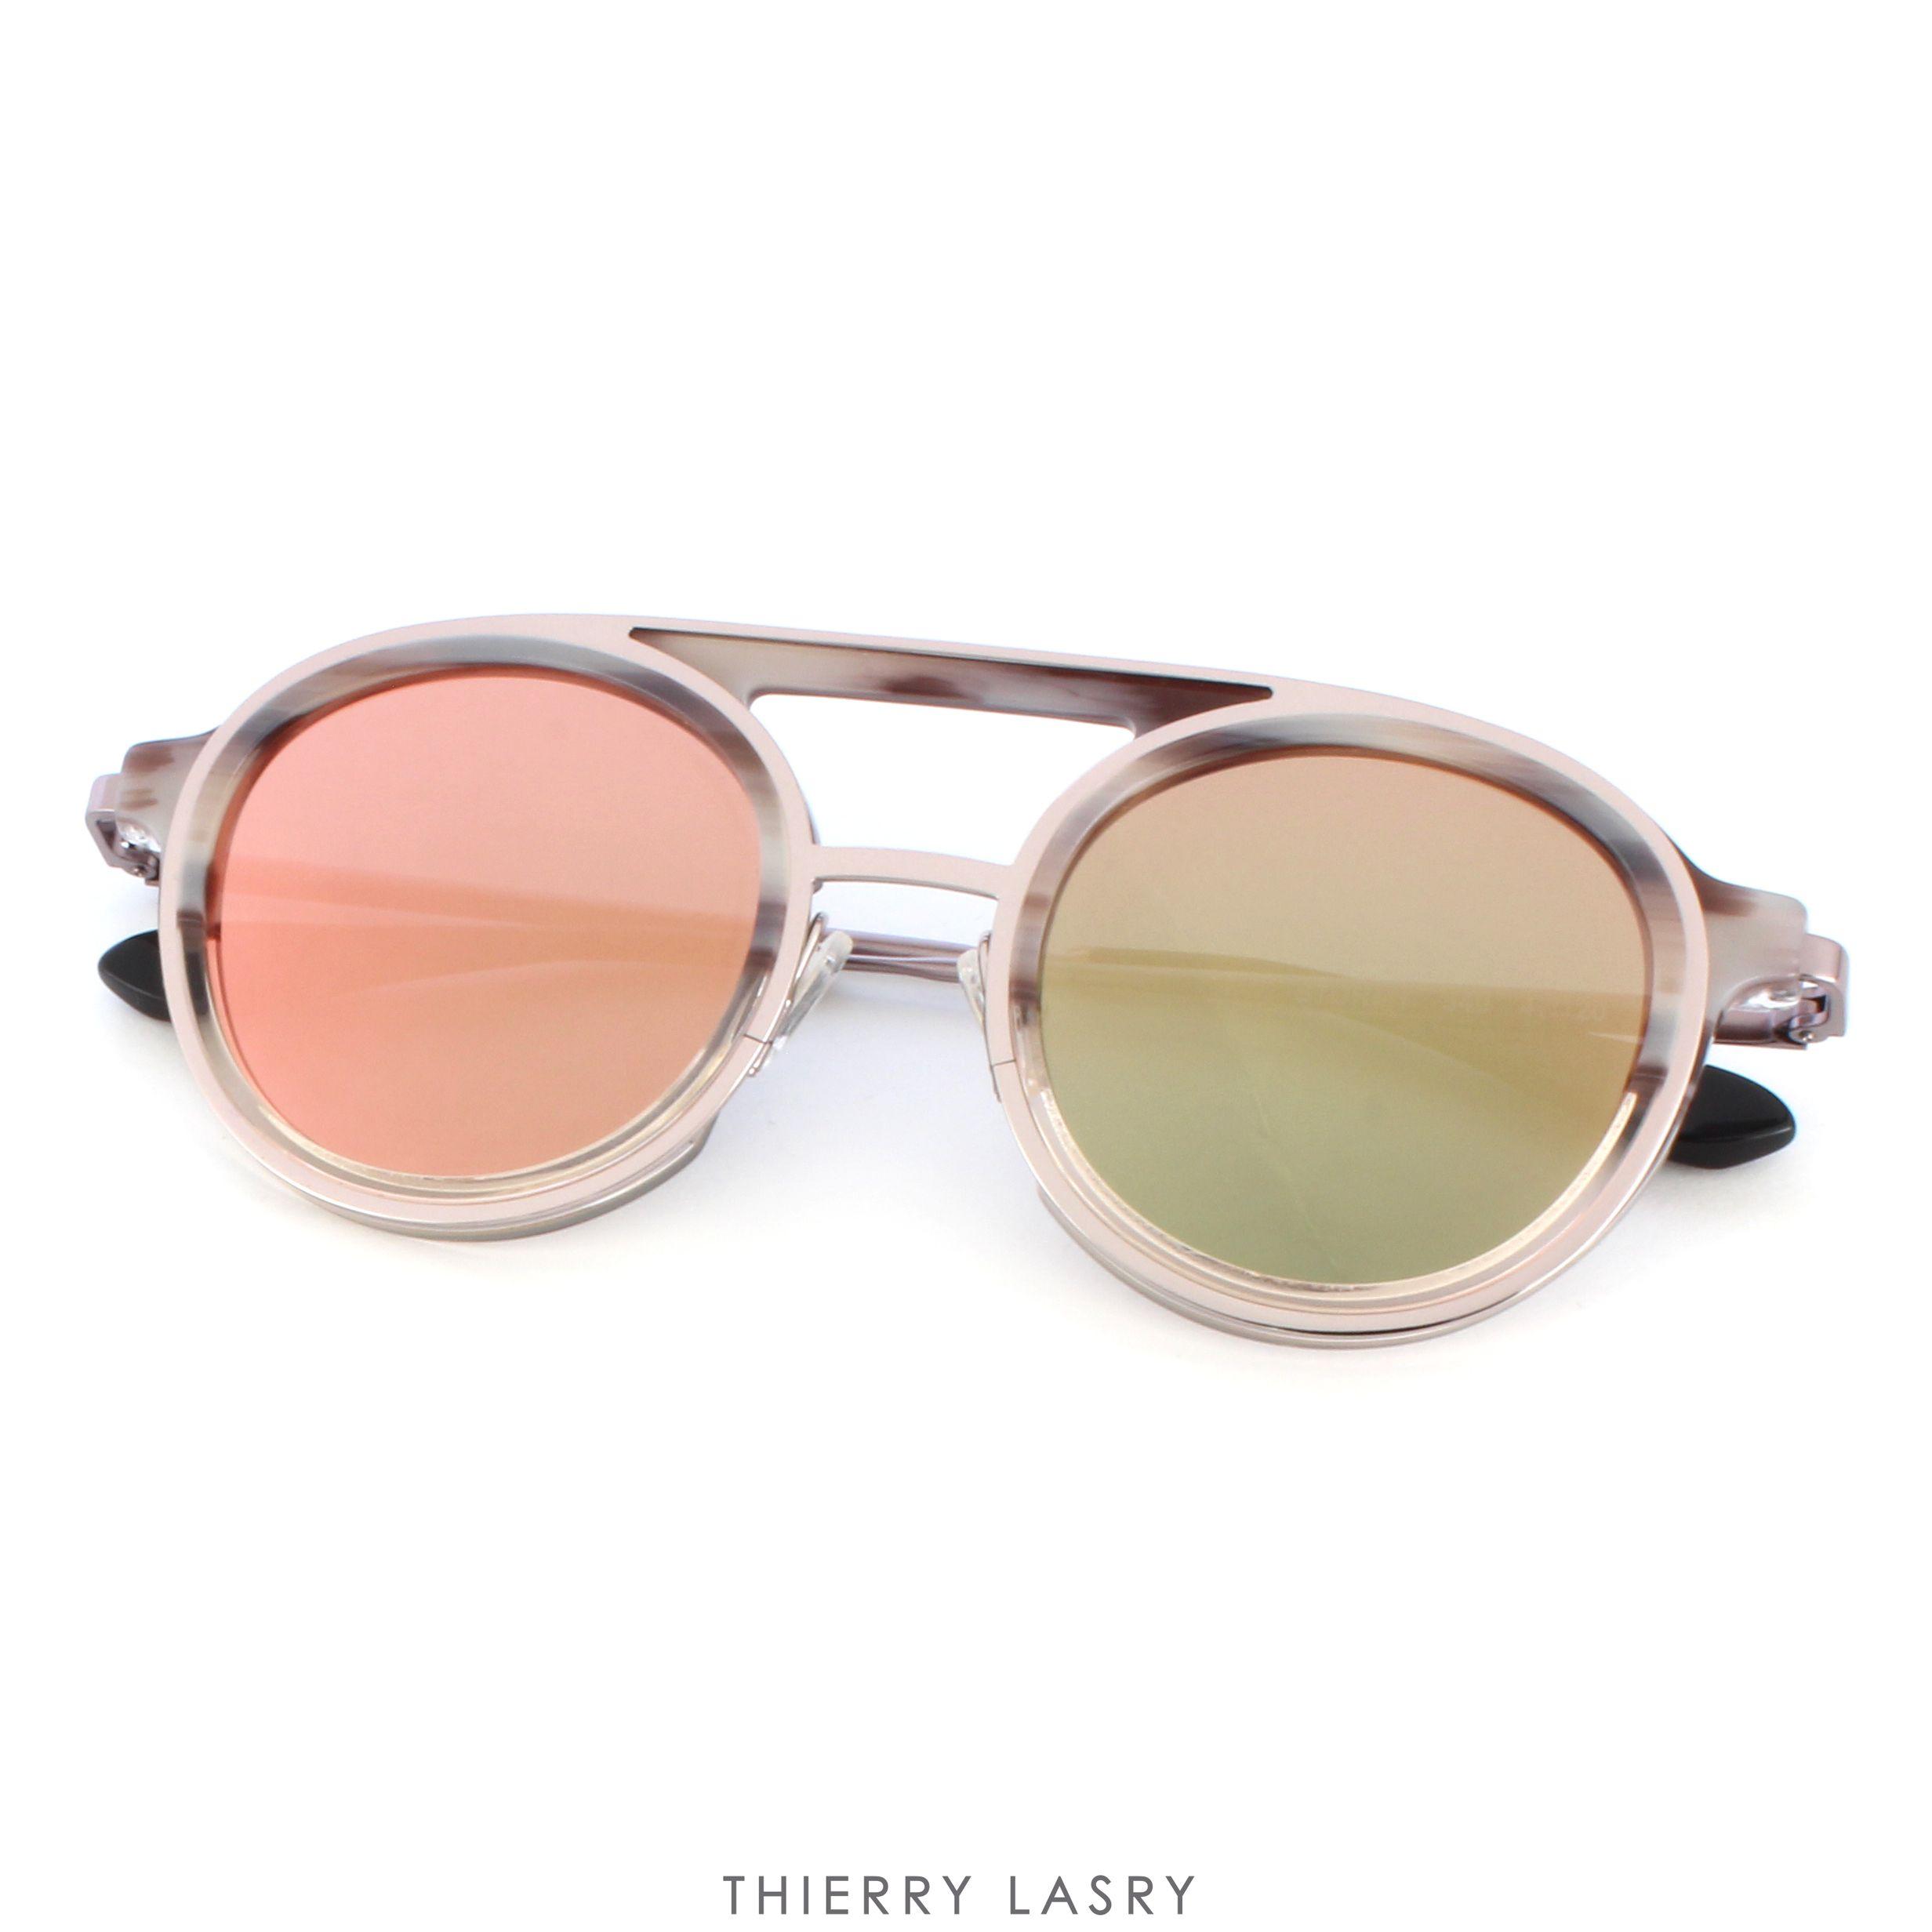 Stormy Thierry lasry sunglasses, Sunglasses, Fashion